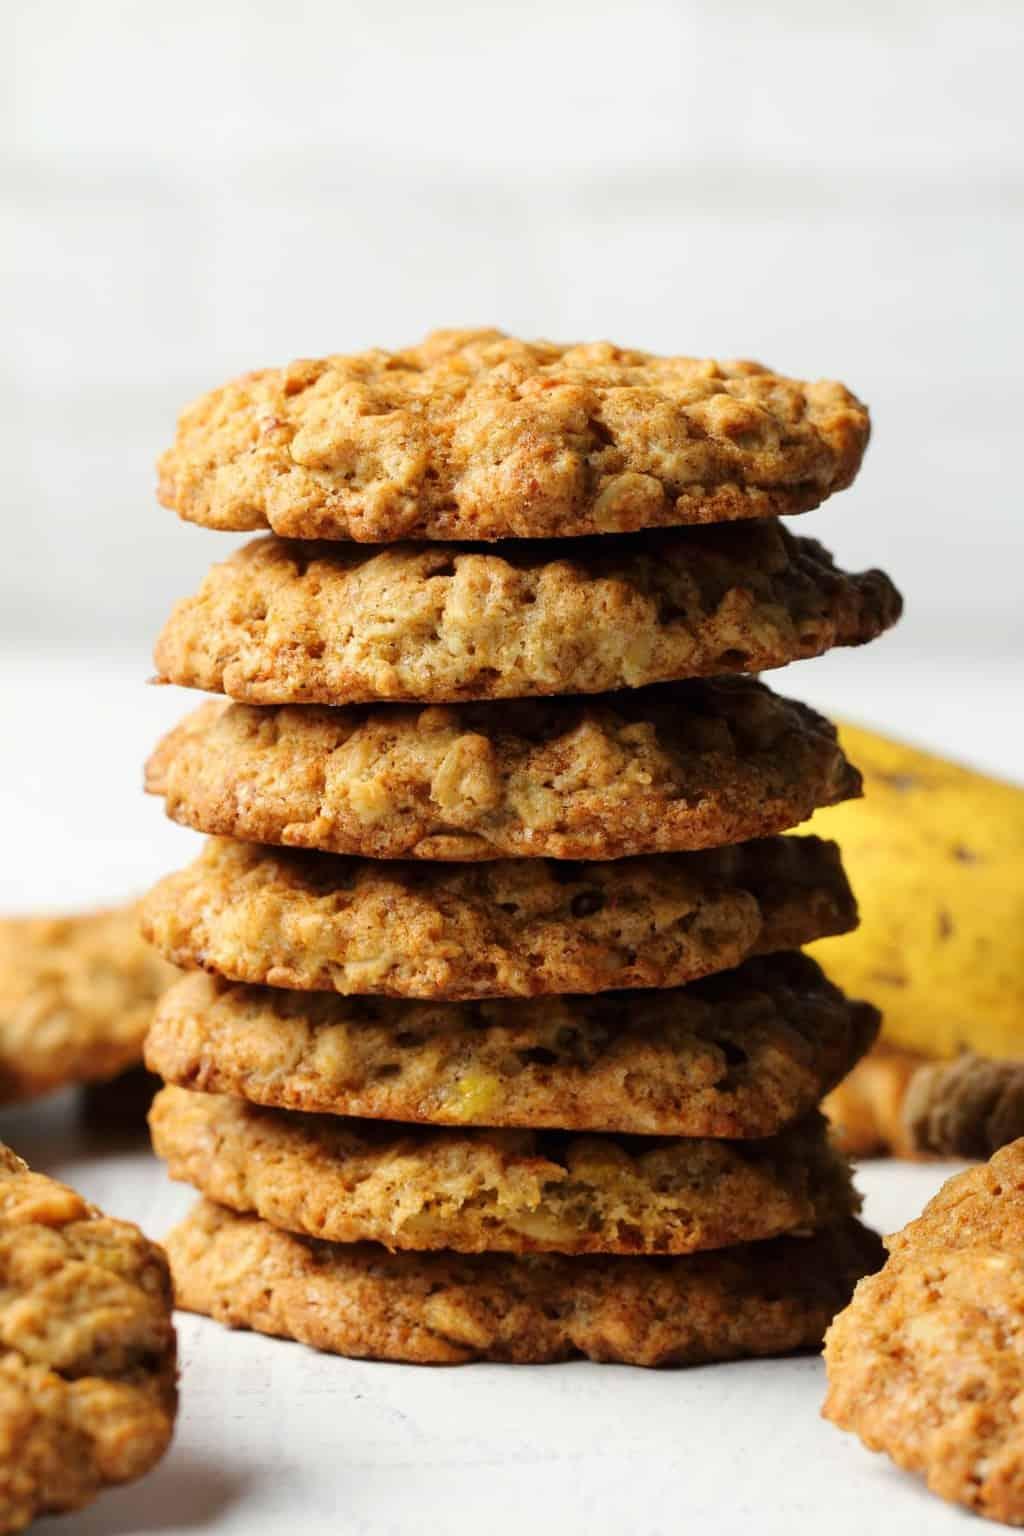 Vegan banana oatmeal cookies in a stack.